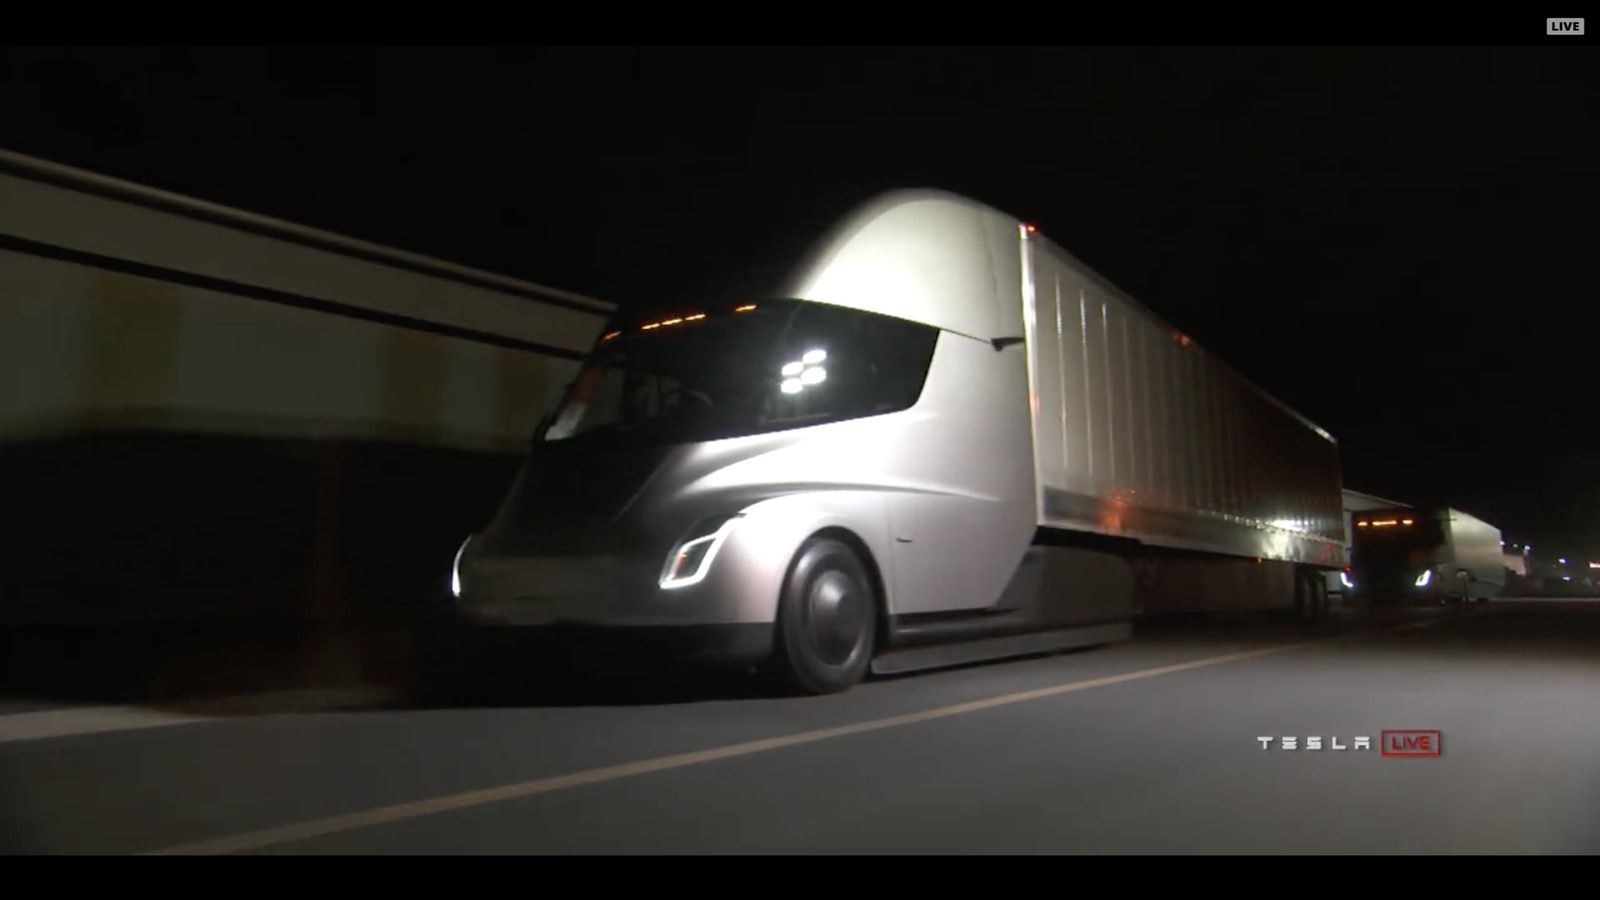 Semi Trucks Auto Electrical Wiring Diagram 99 350 Yamaha Wolverine Tesla